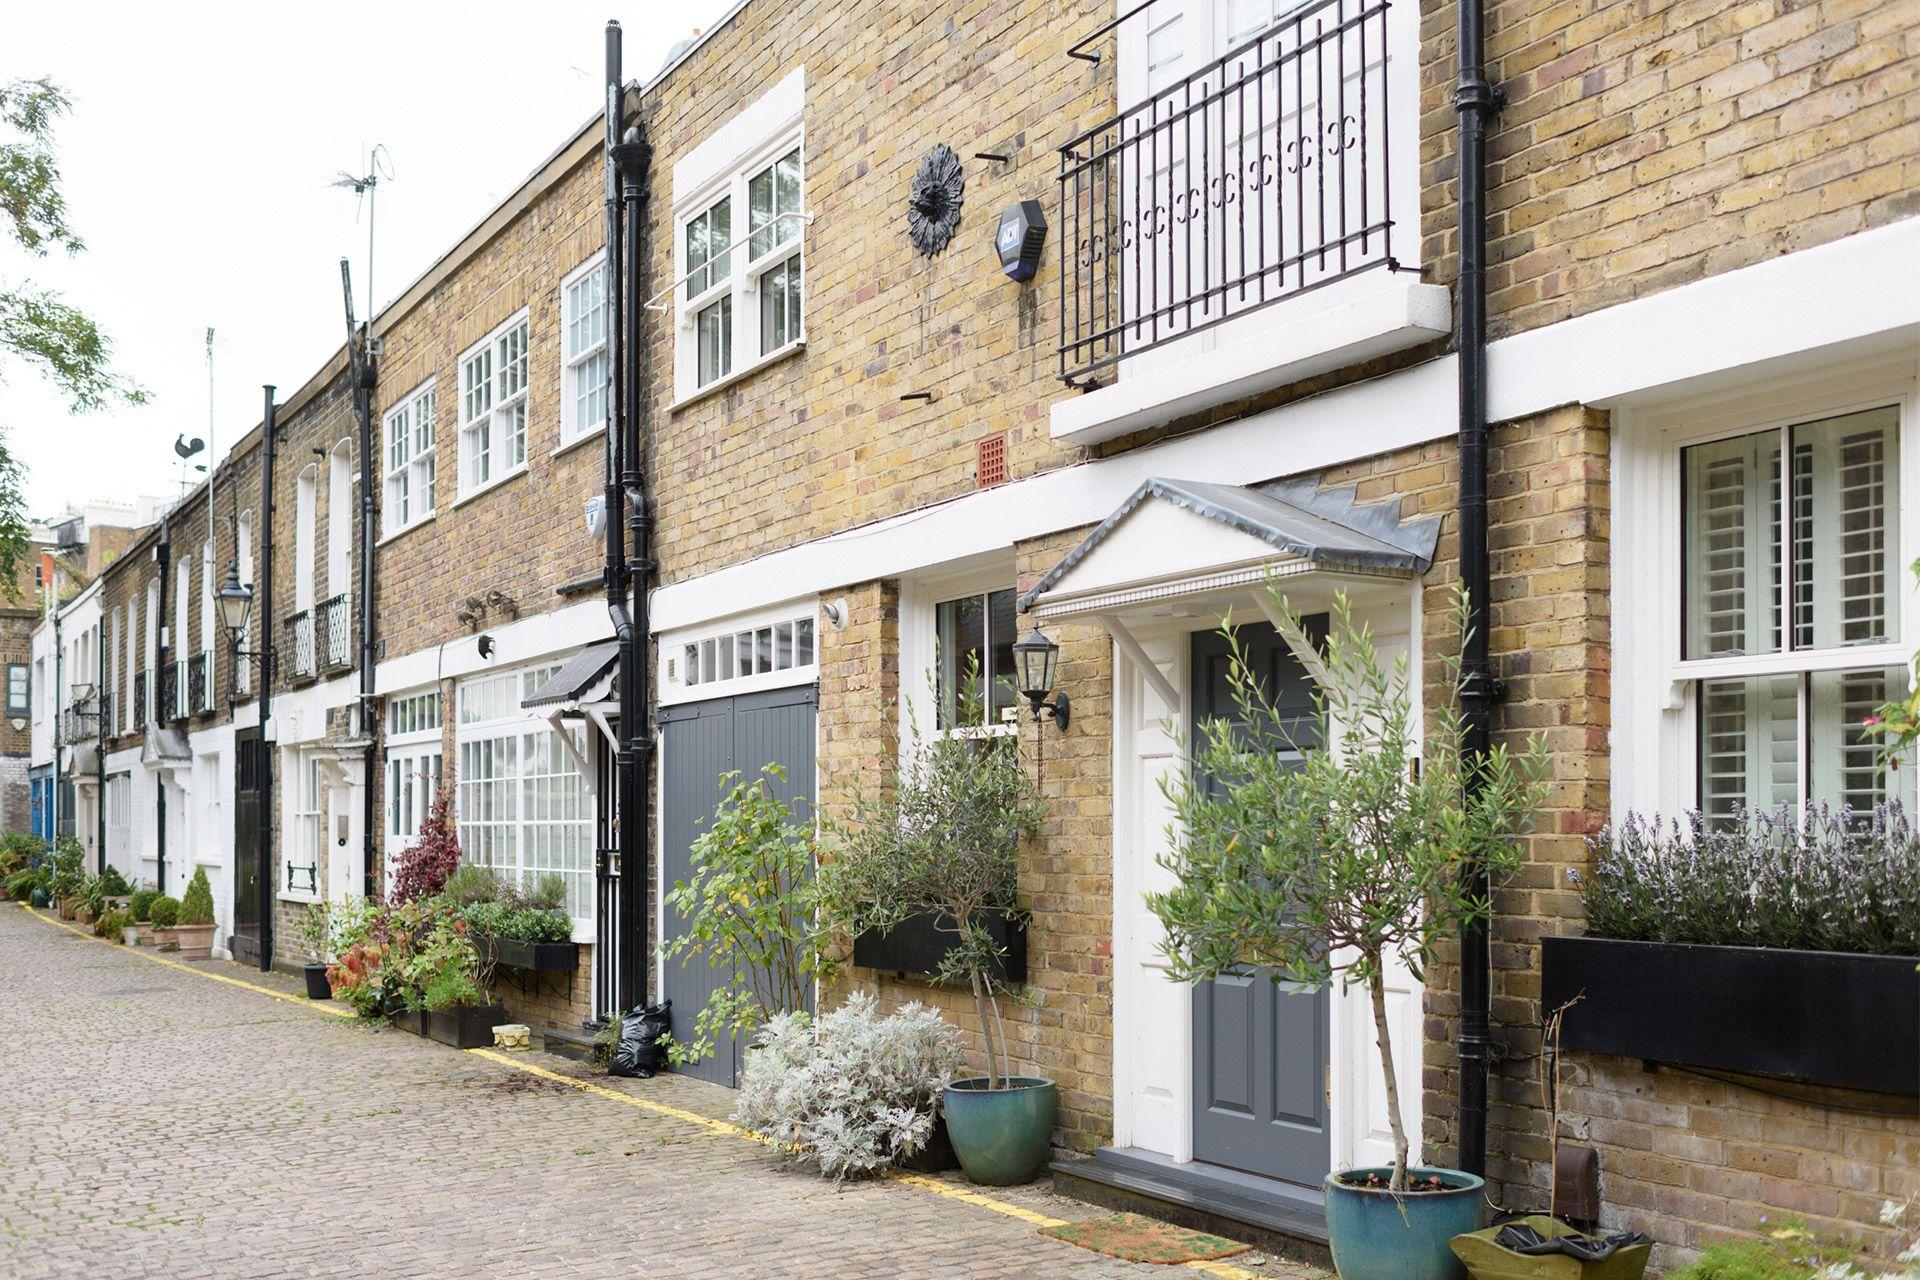 Charming London Mews exterior